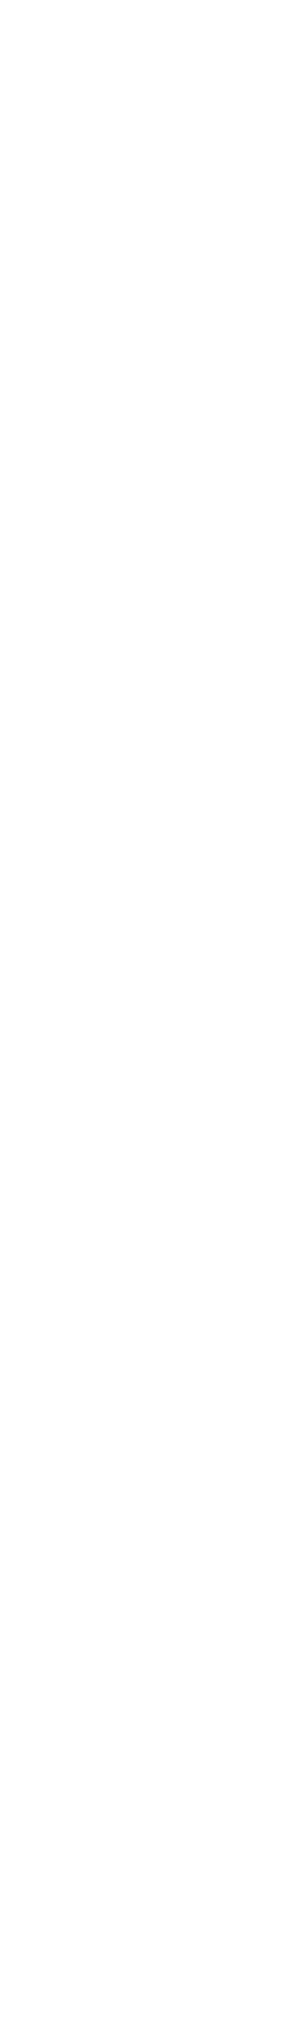 Ansvarsfabriken_logotyp_text_vit_roterad